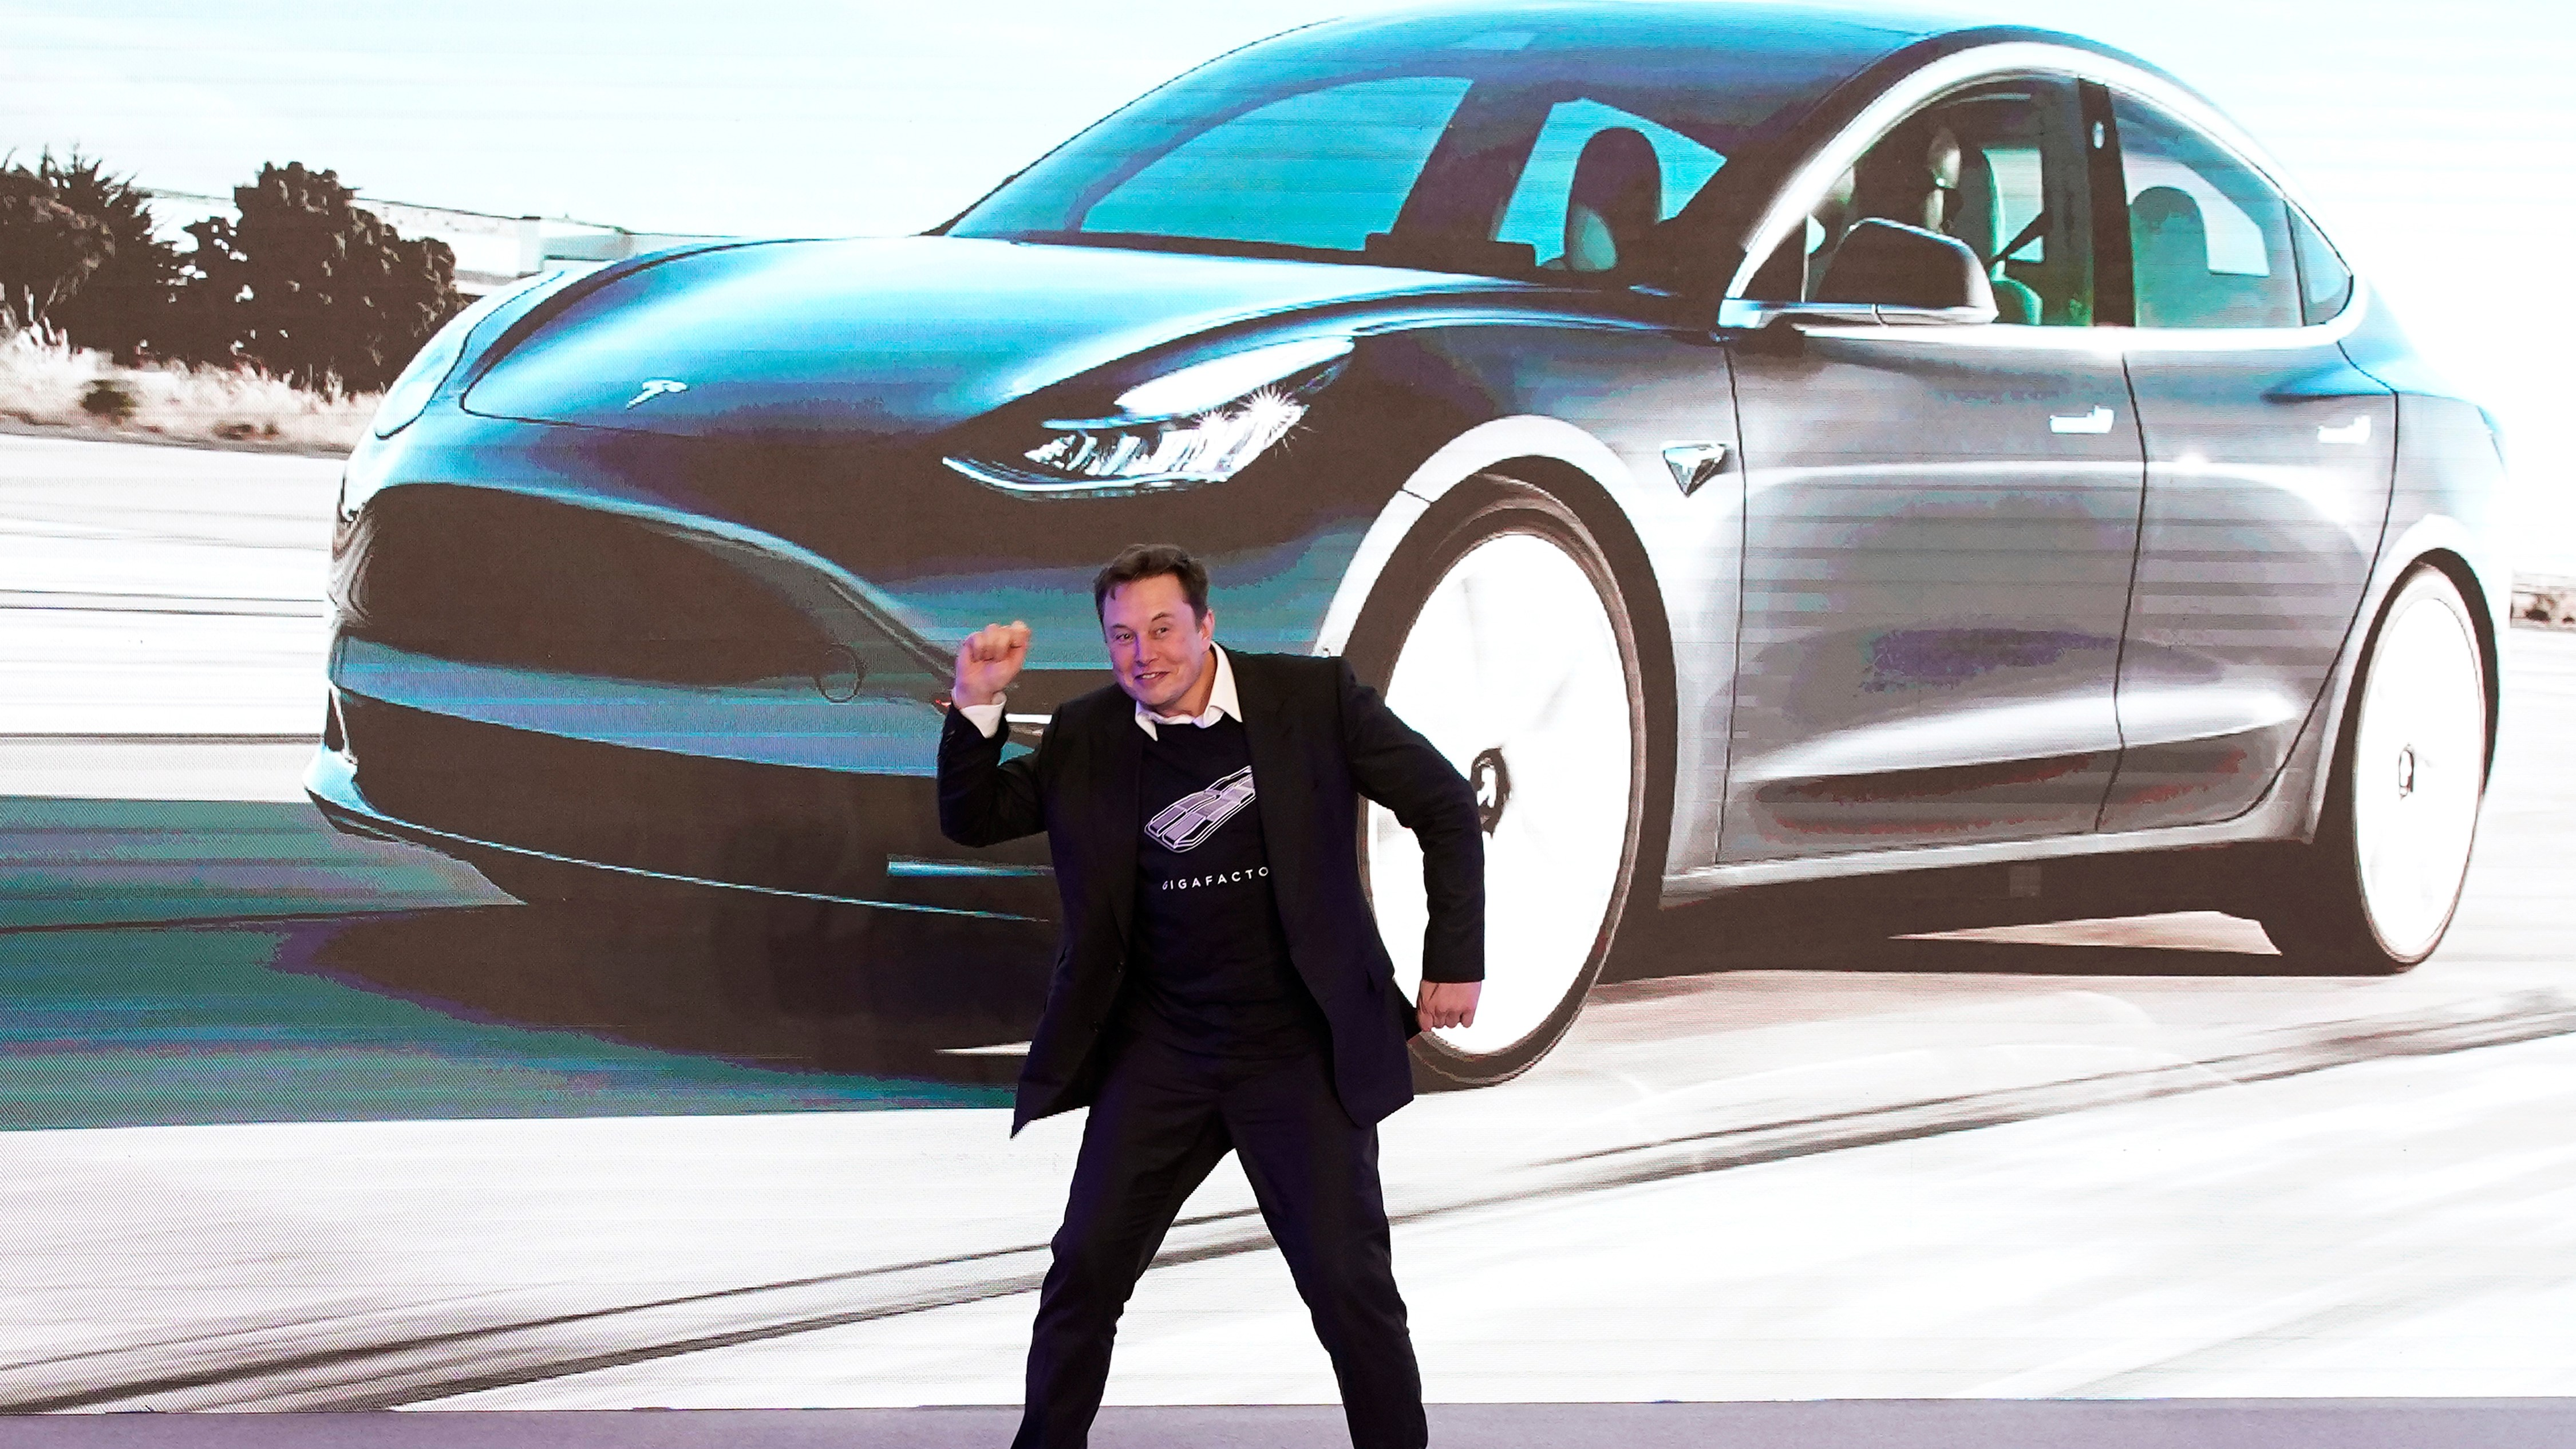 Tesla Looks To Make Its China Operation As Nimble As Its Cars Nikkei Asia